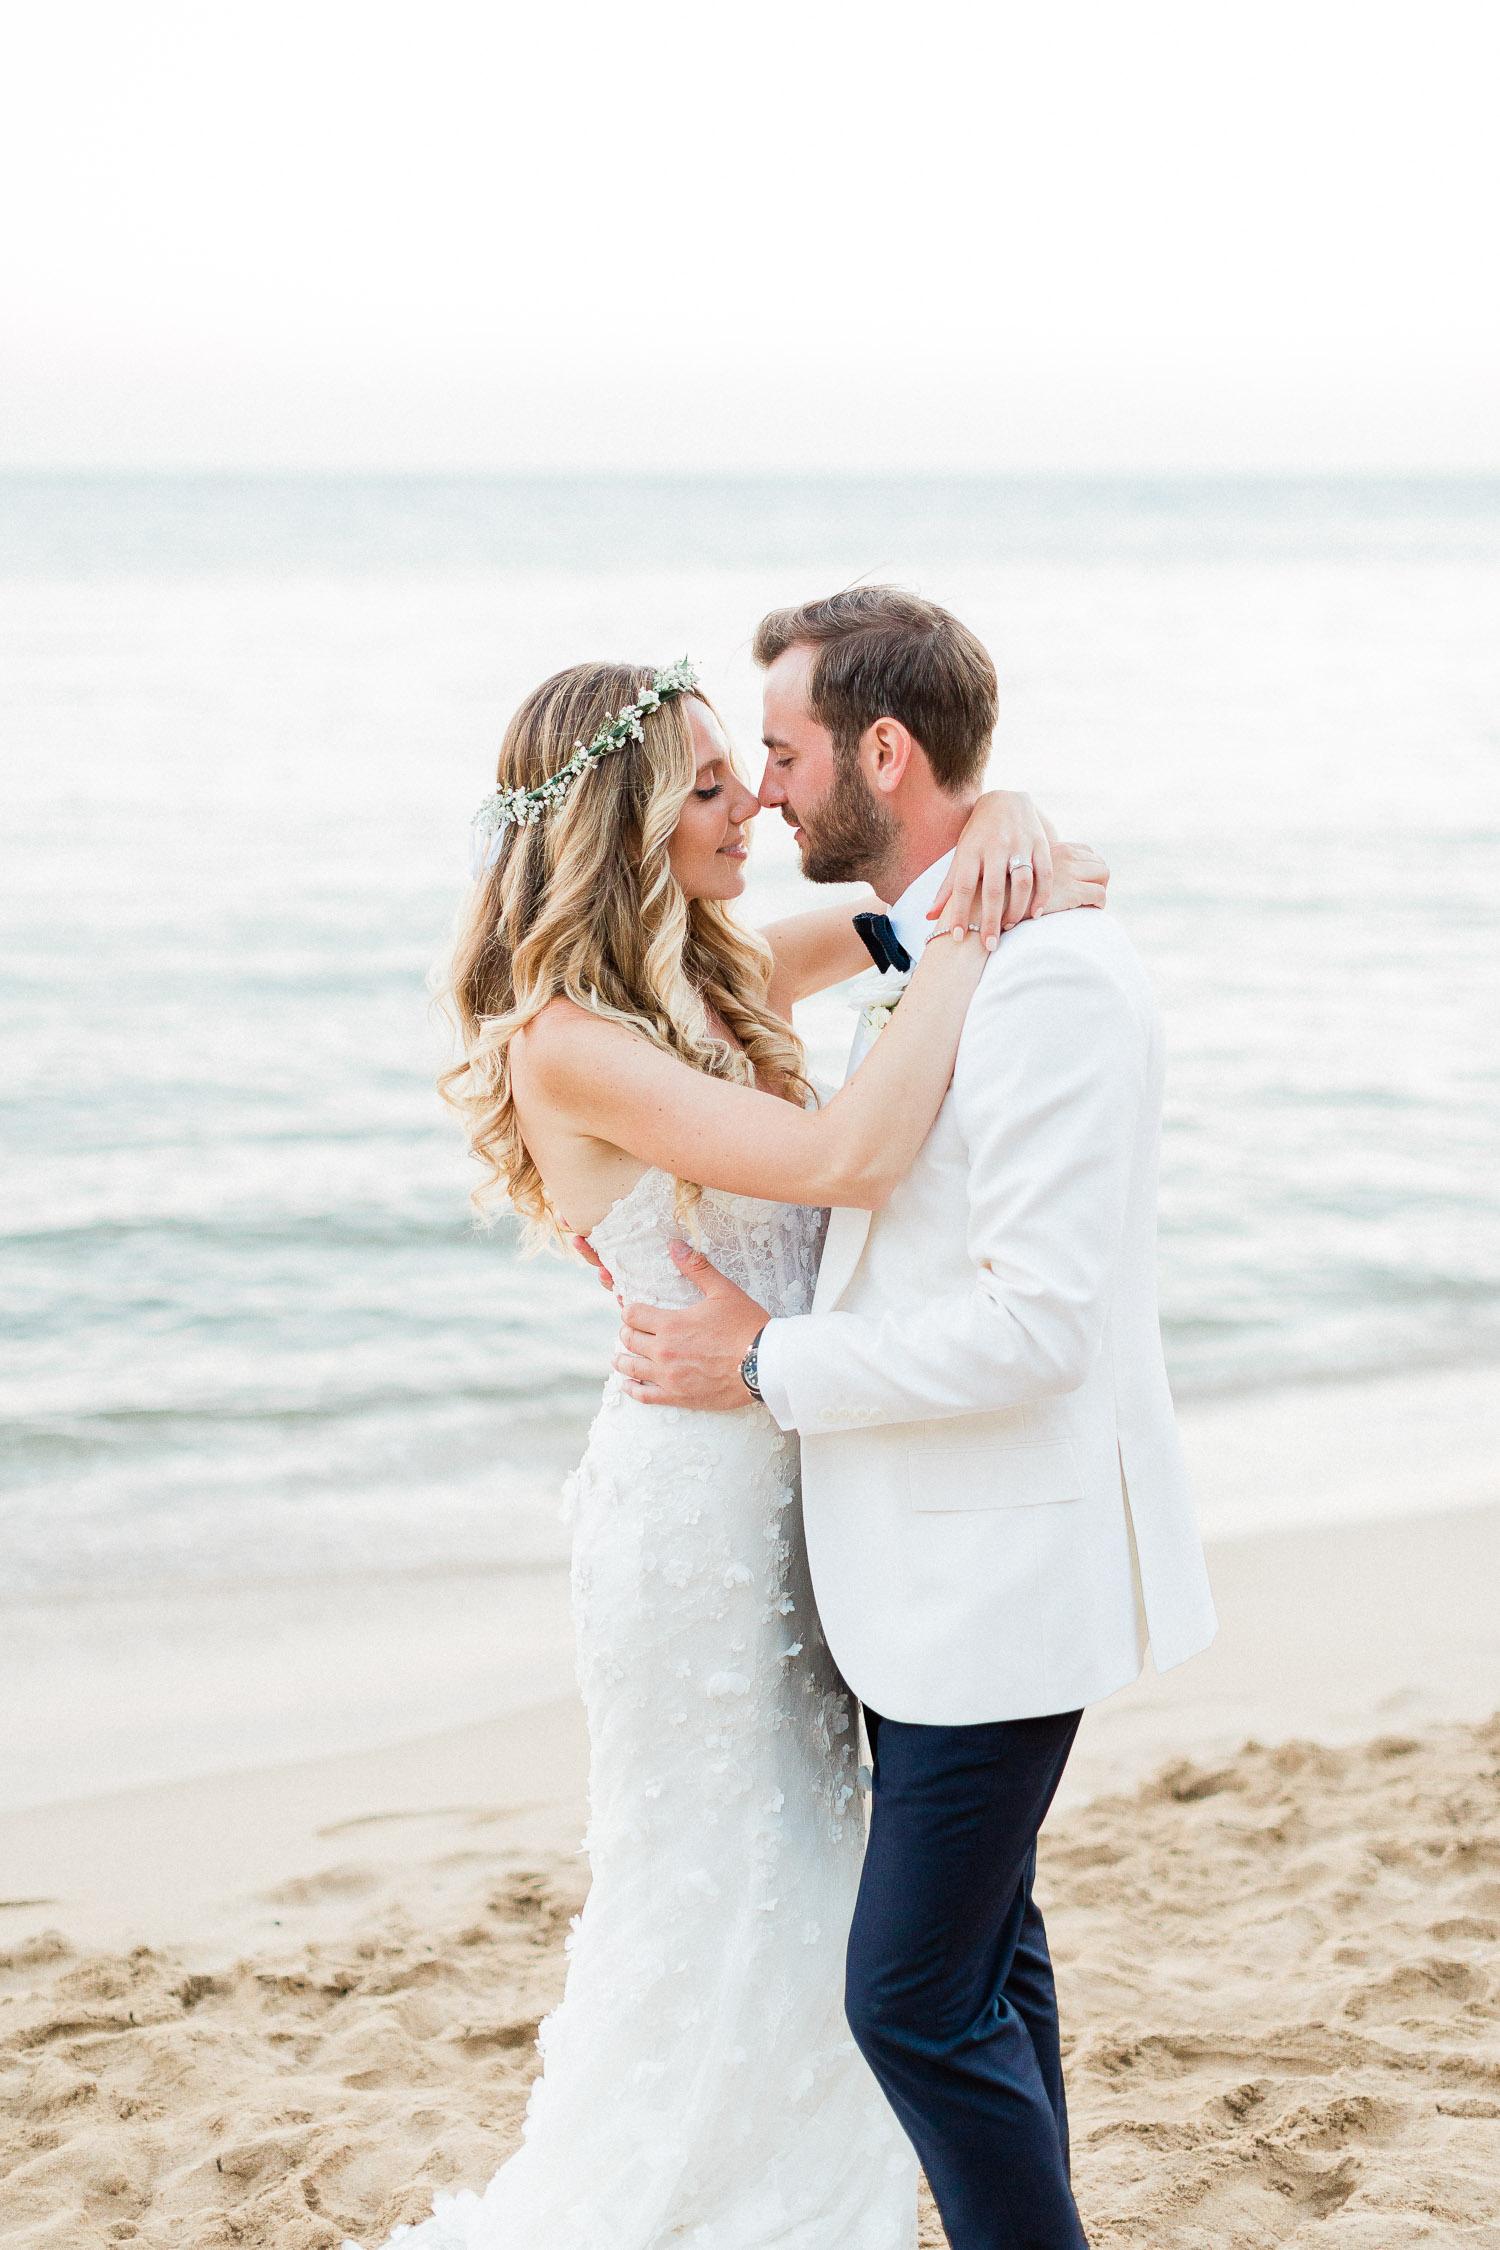 sweet moment of newlyweds on Corfu beach